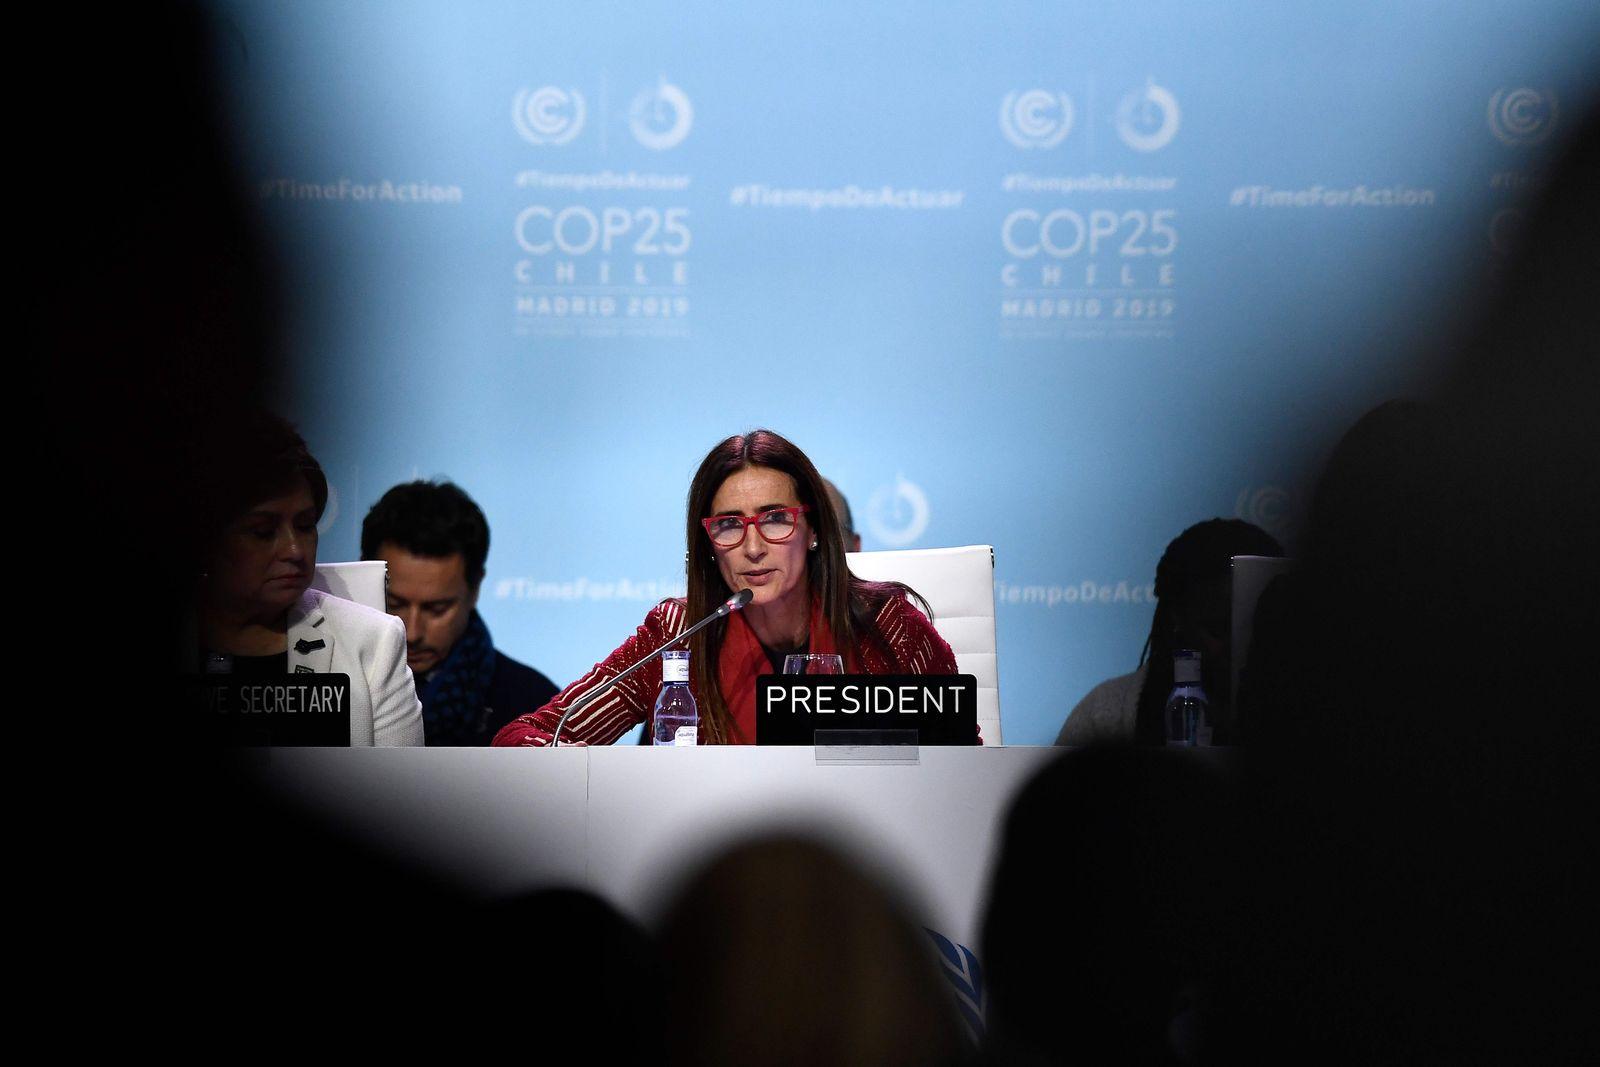 COP25/ Klimakonferenz/ Madrid